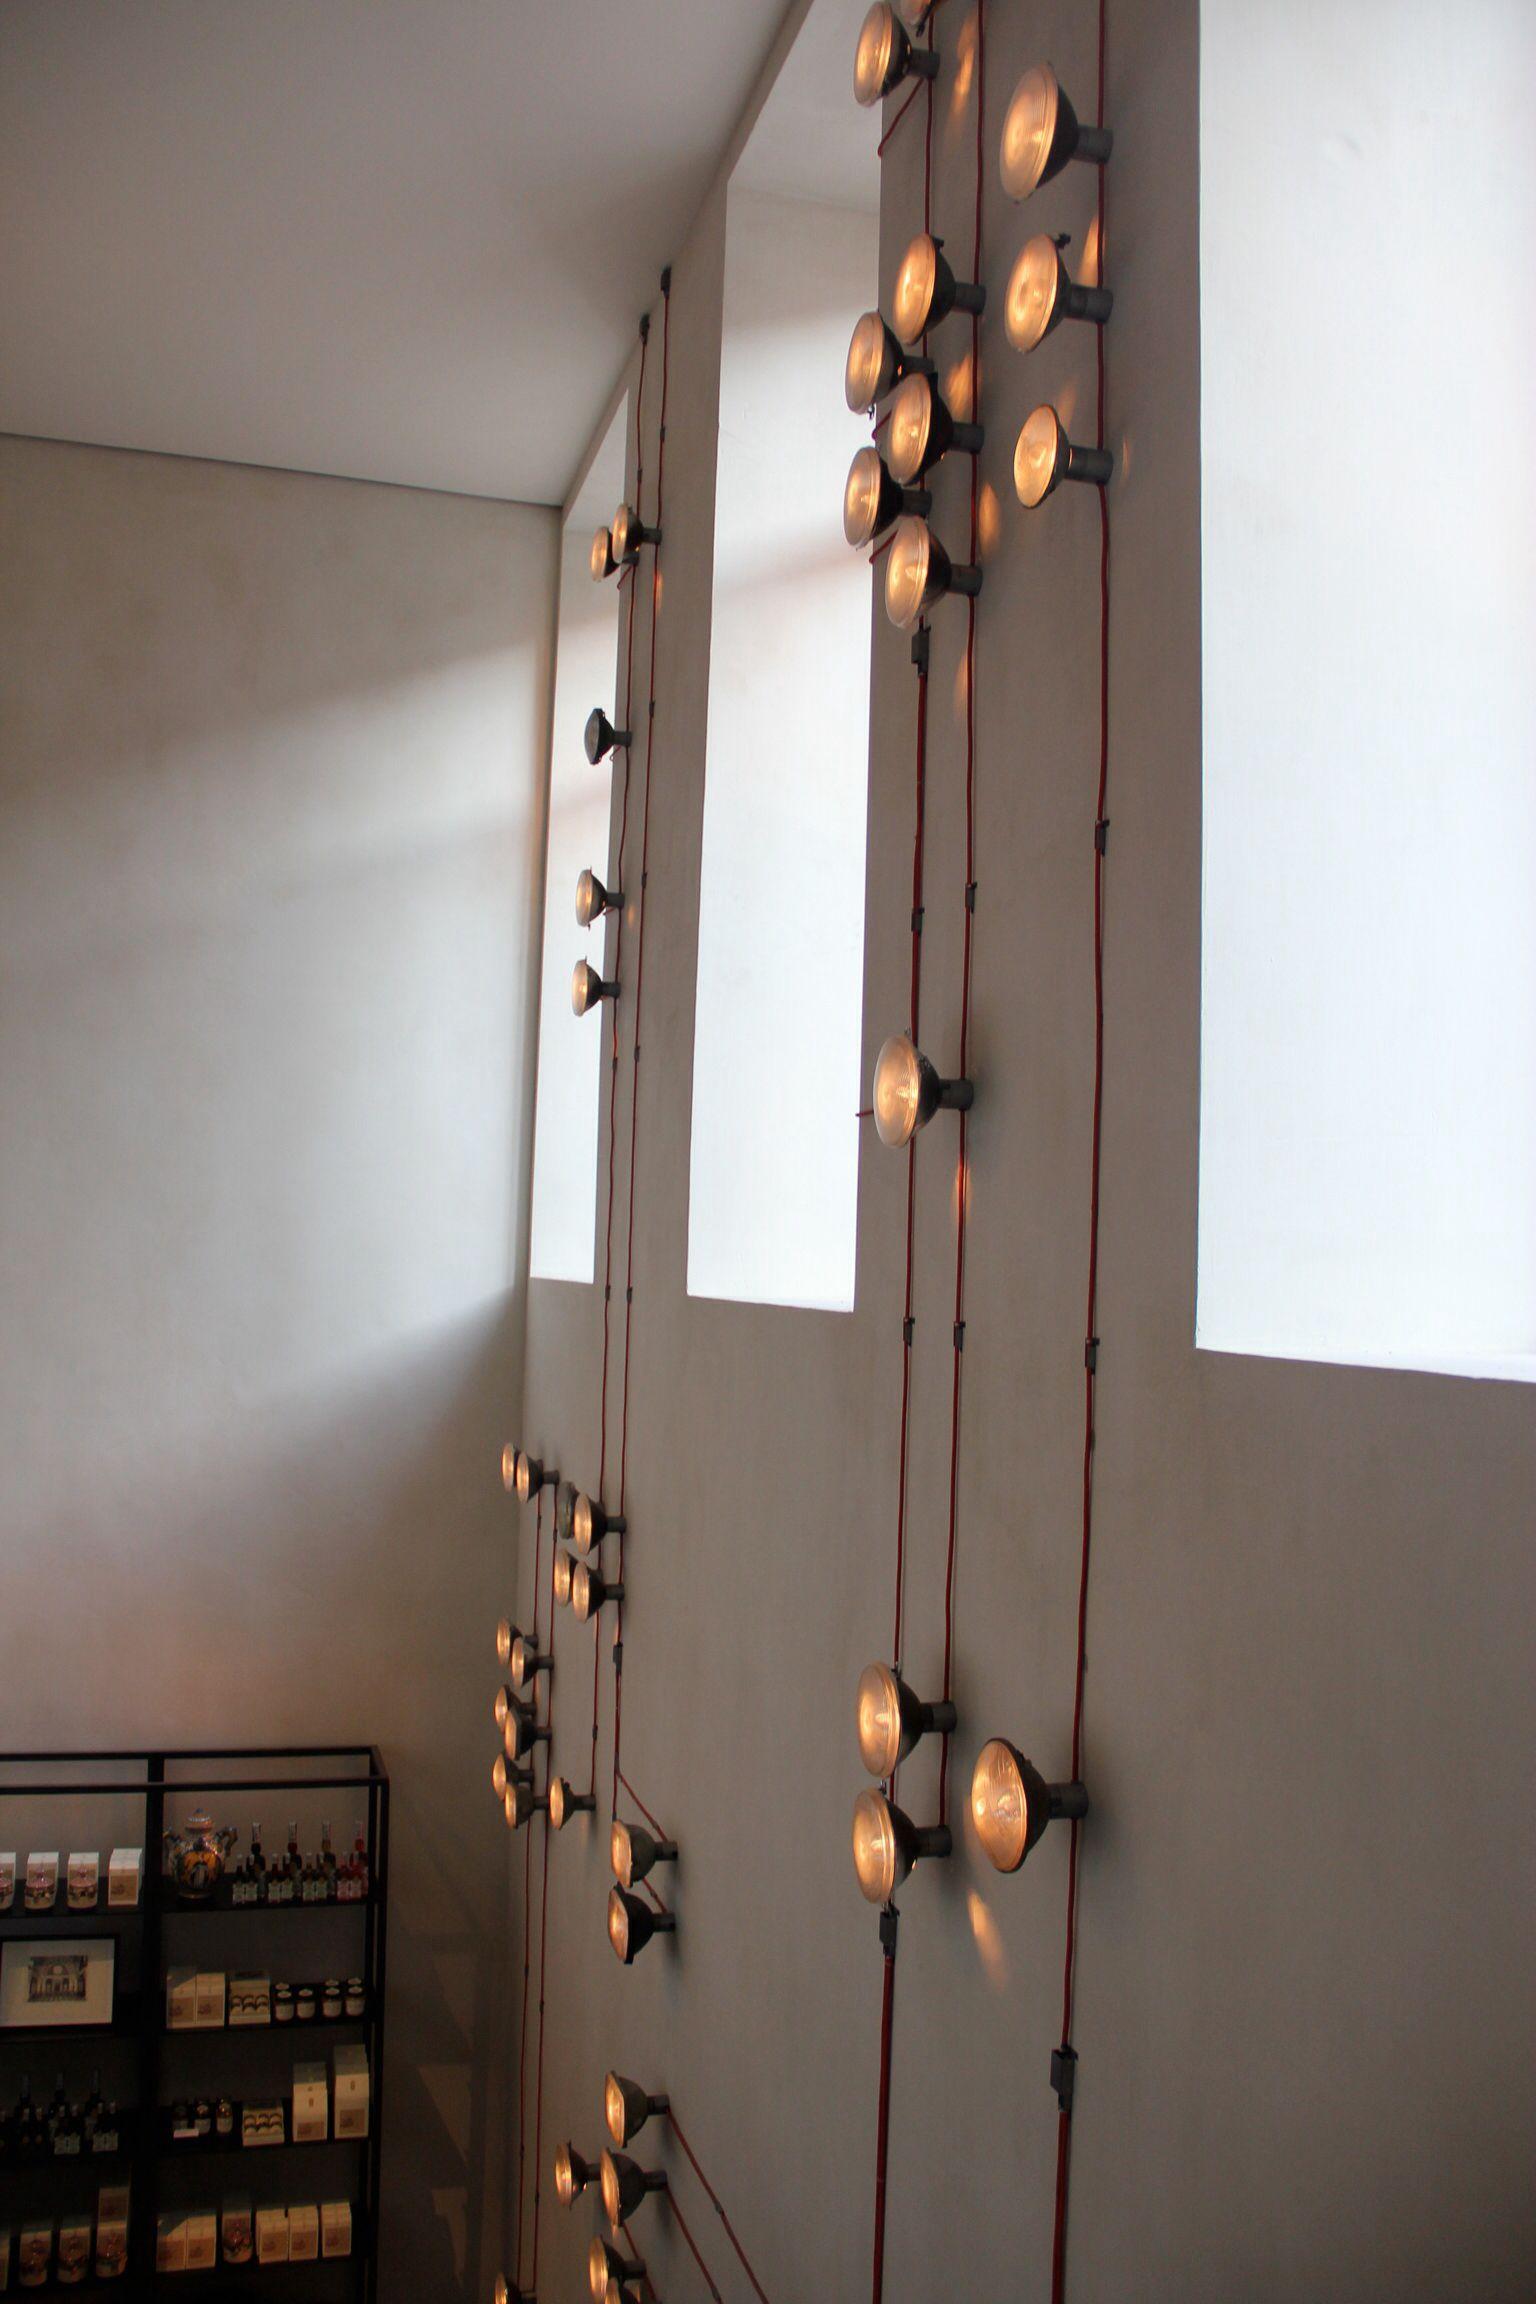 Cool wall mounted lights in Antwerp restaurant